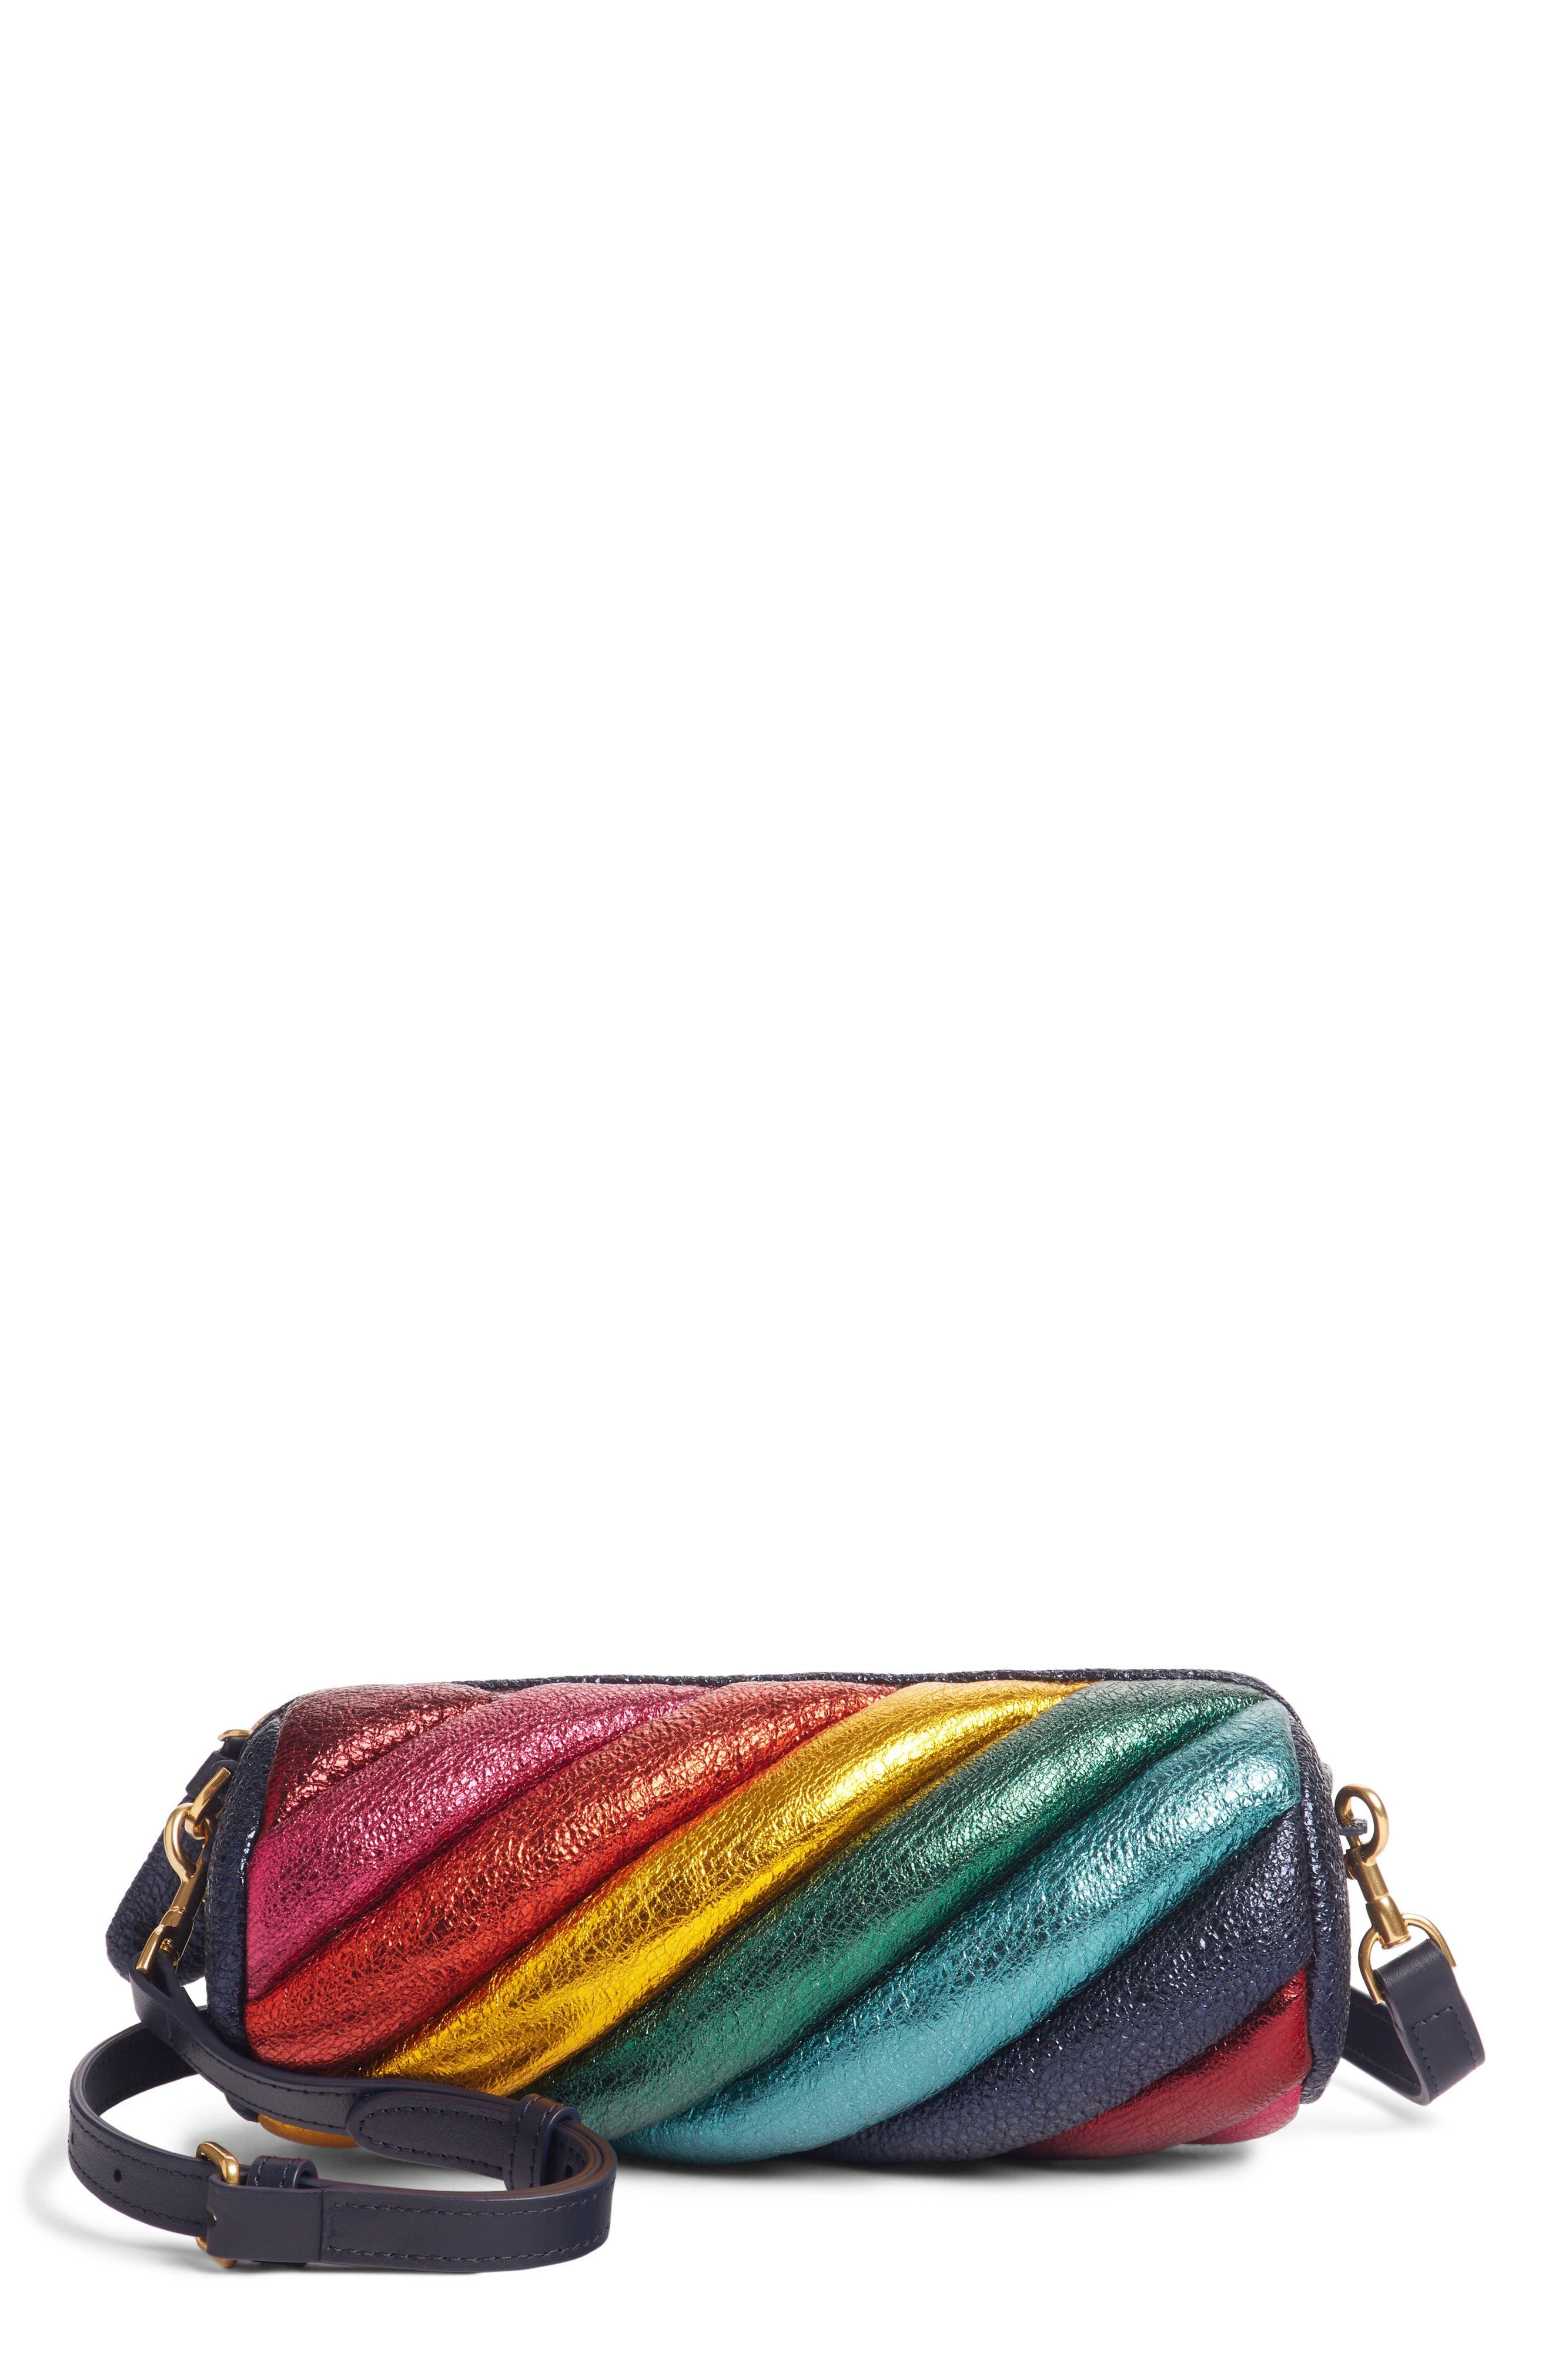 Marshmallow Twist Metallic Leather Crossbody Bag,                             Main thumbnail 1, color,                             BLACK MULTI